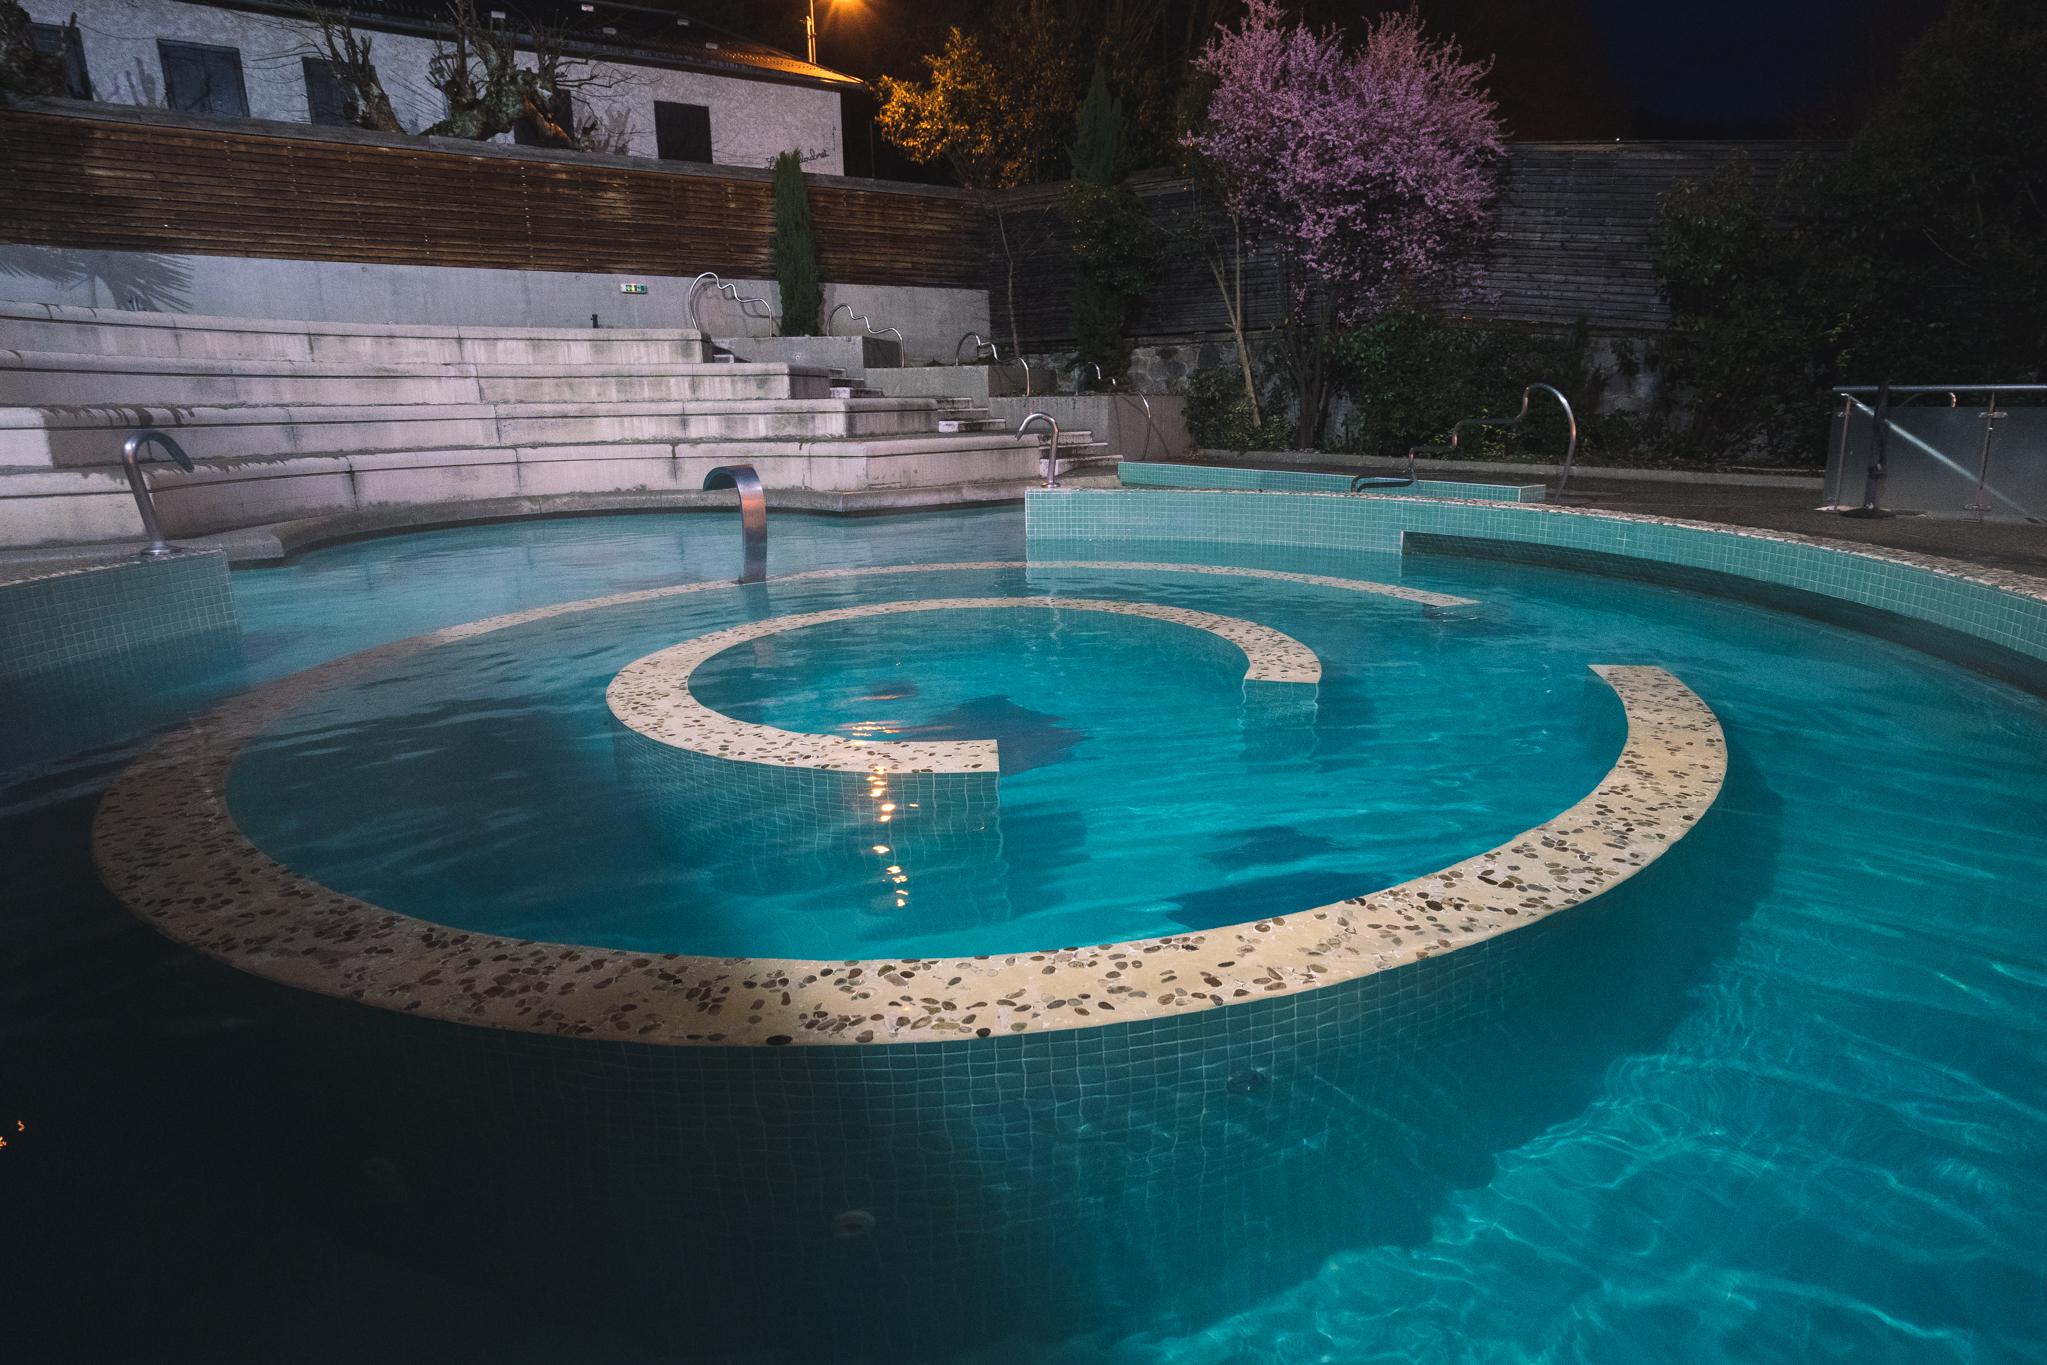 bains-couloubret-ax-les-thermes-ariege-eaux-thermales